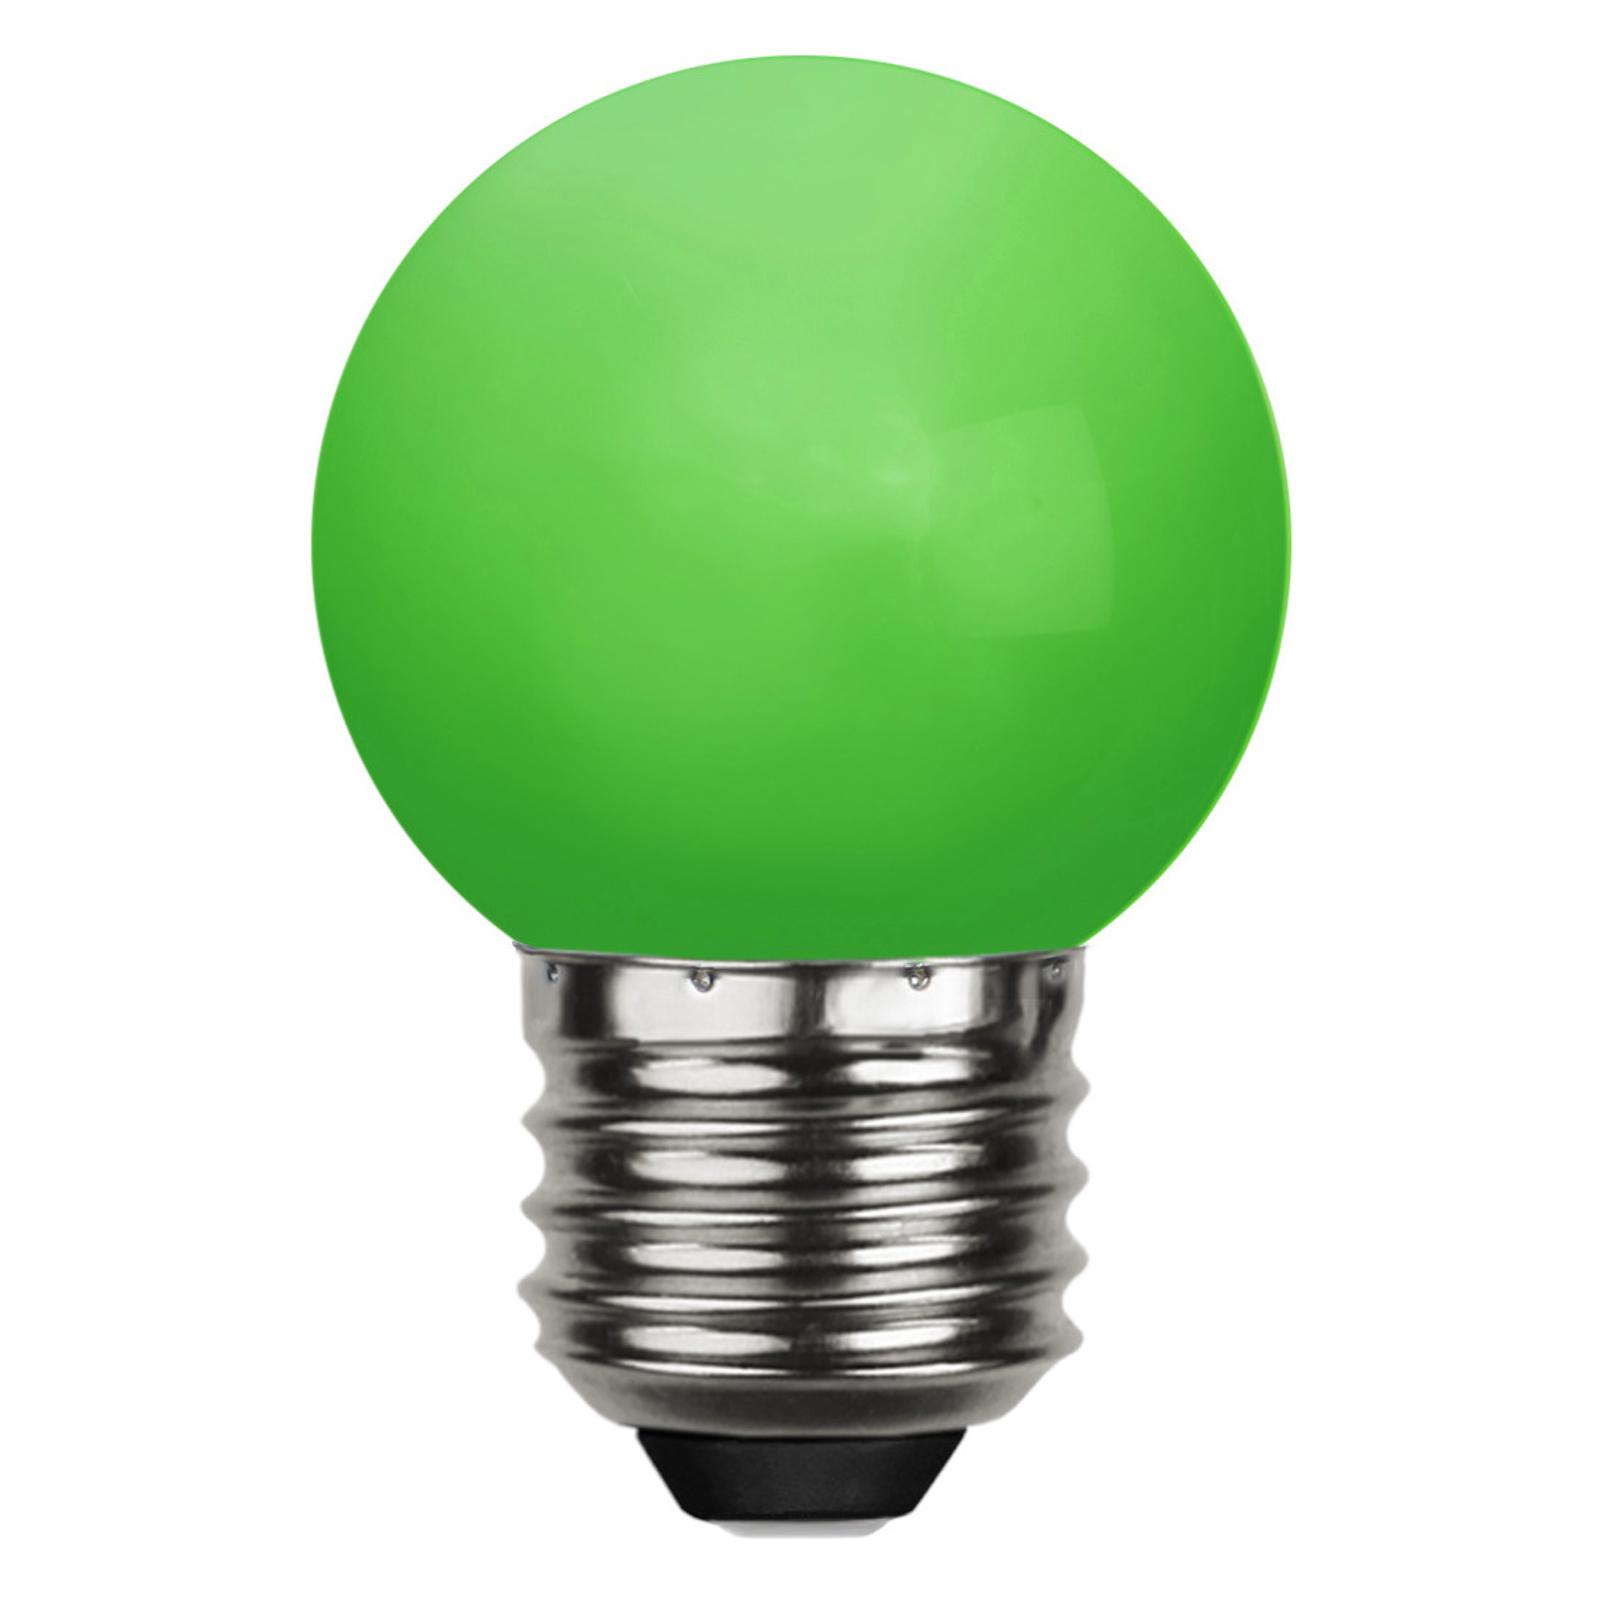 LED-Lampe E27 G45 für Lichterketten, grün